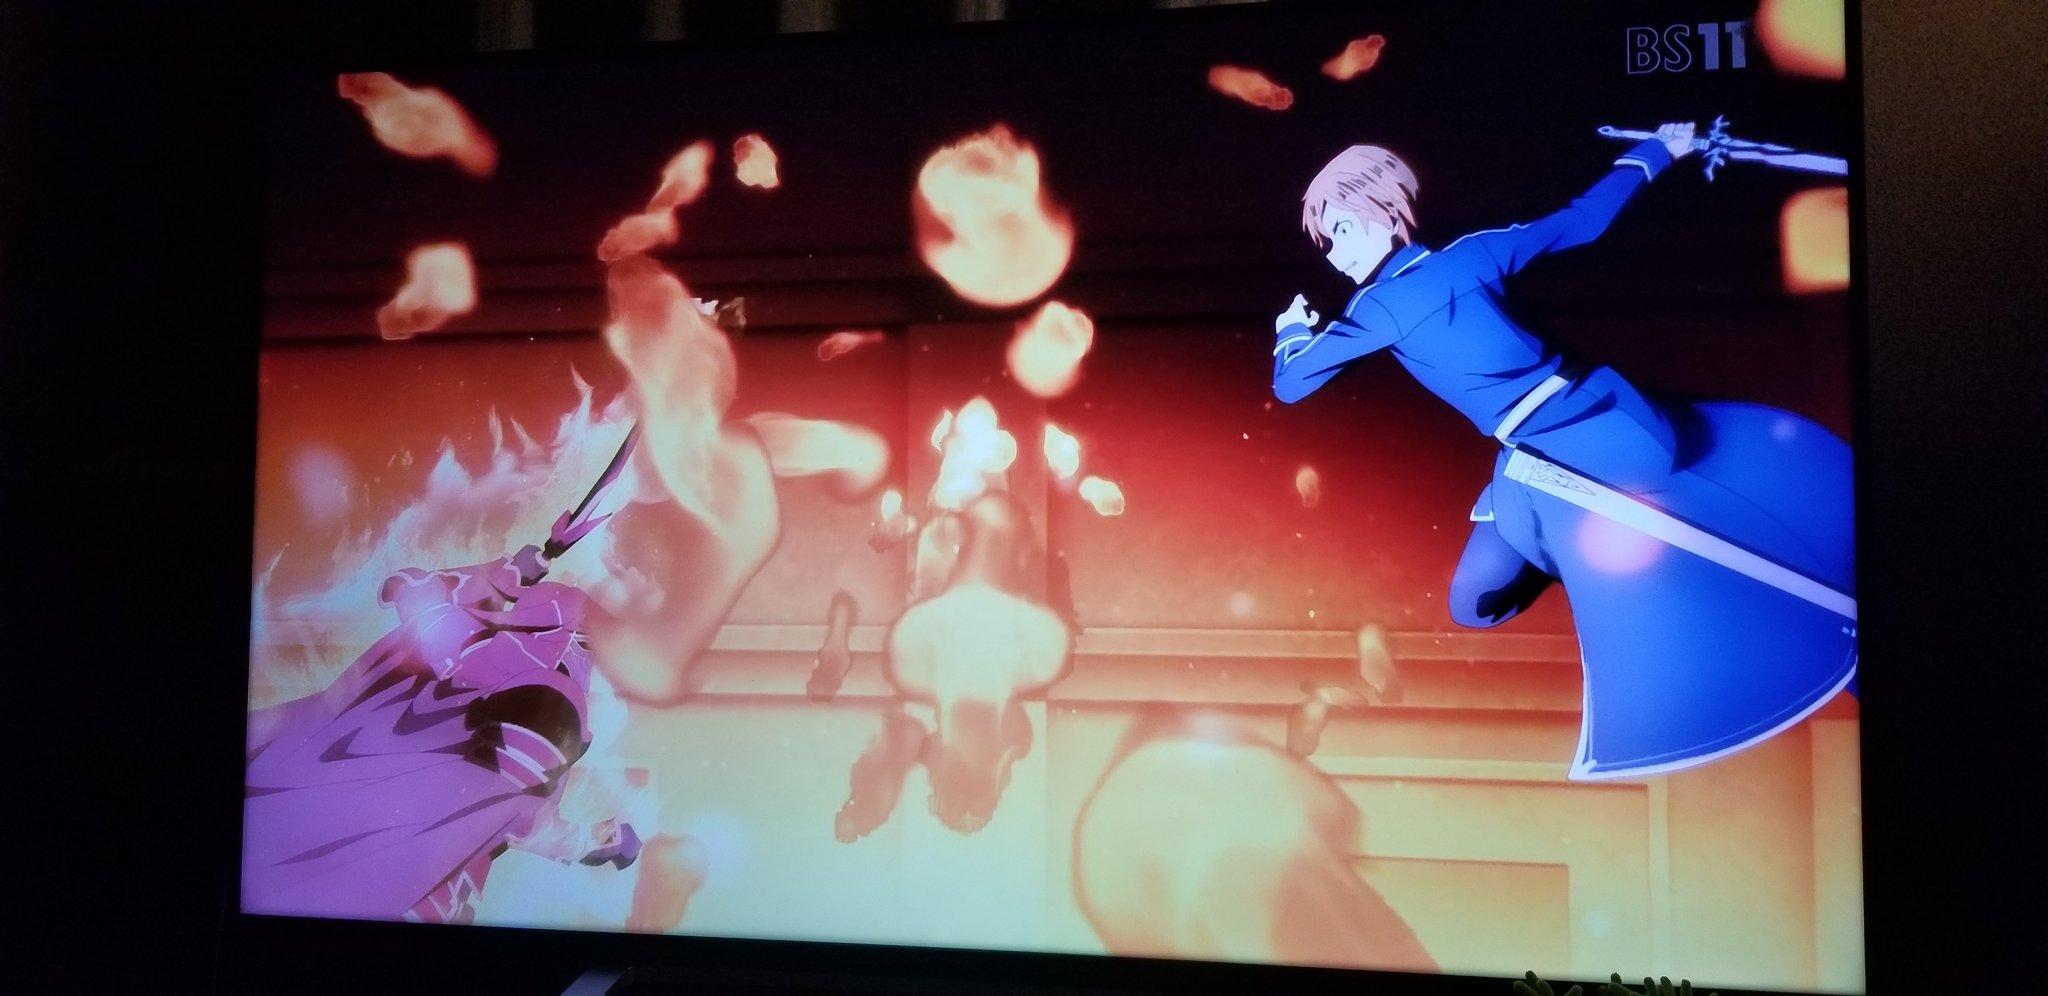 #sao_anime ユージオの中には常にアリスがいる https://t.co/FtA4Zbg3V8